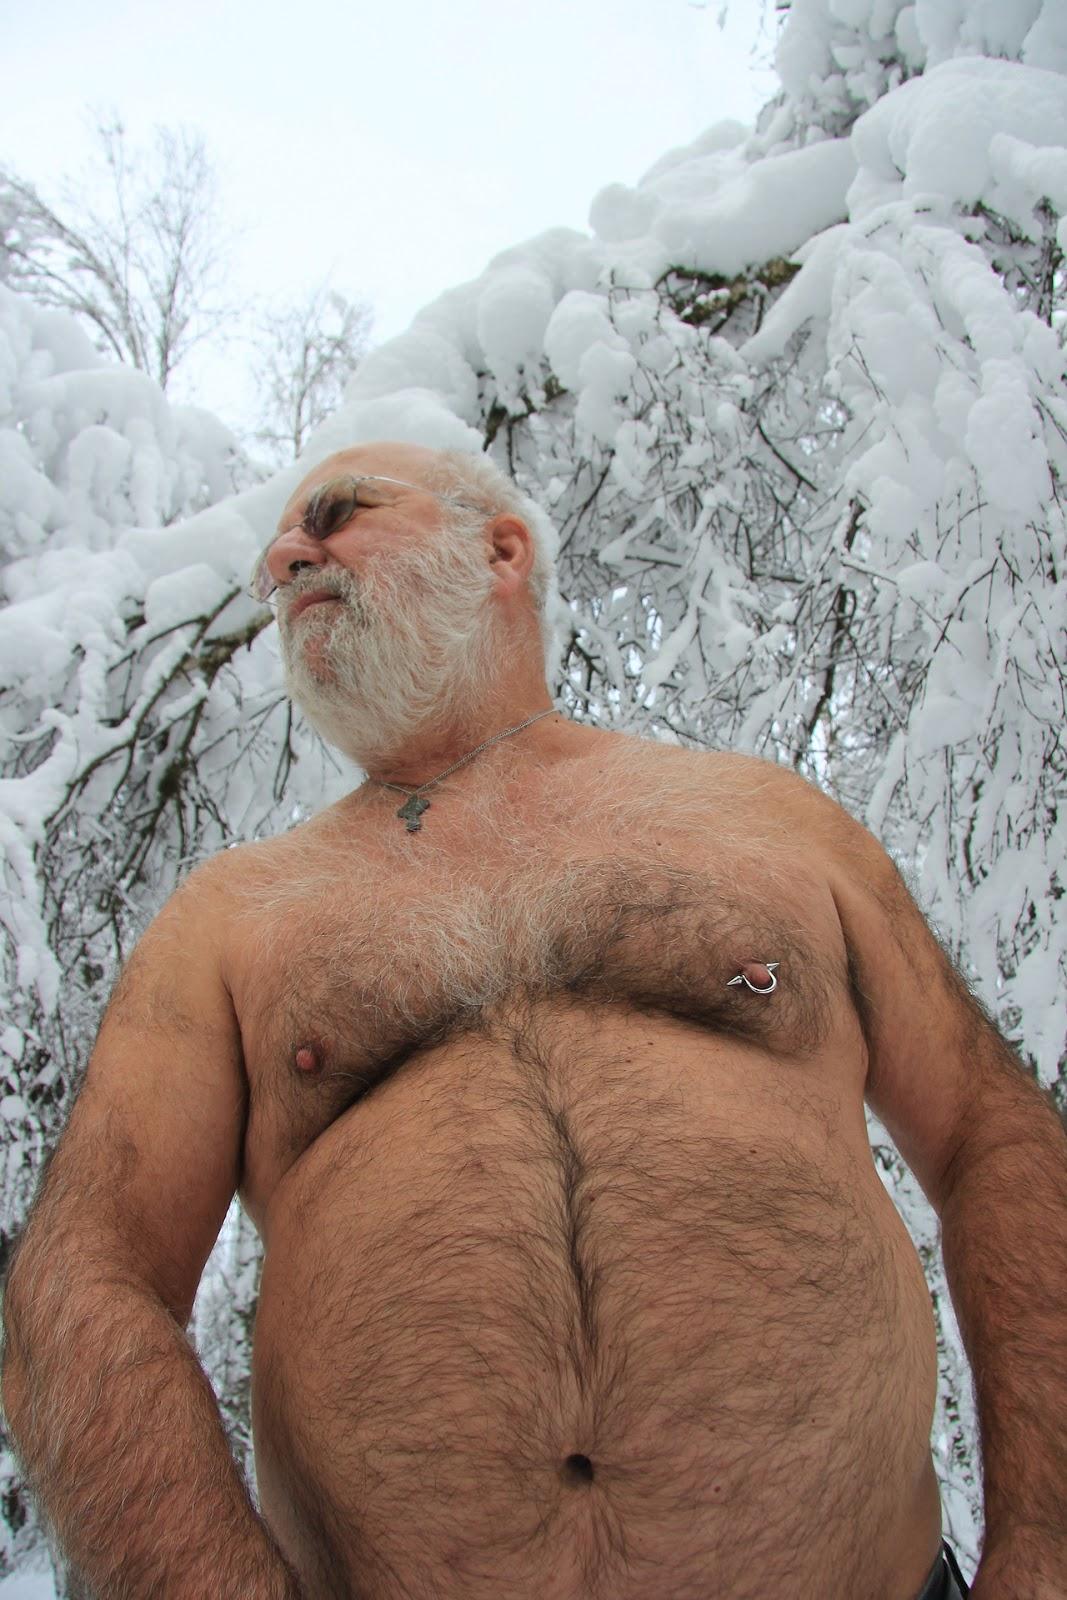 Naked Fat Hairy Gay Man